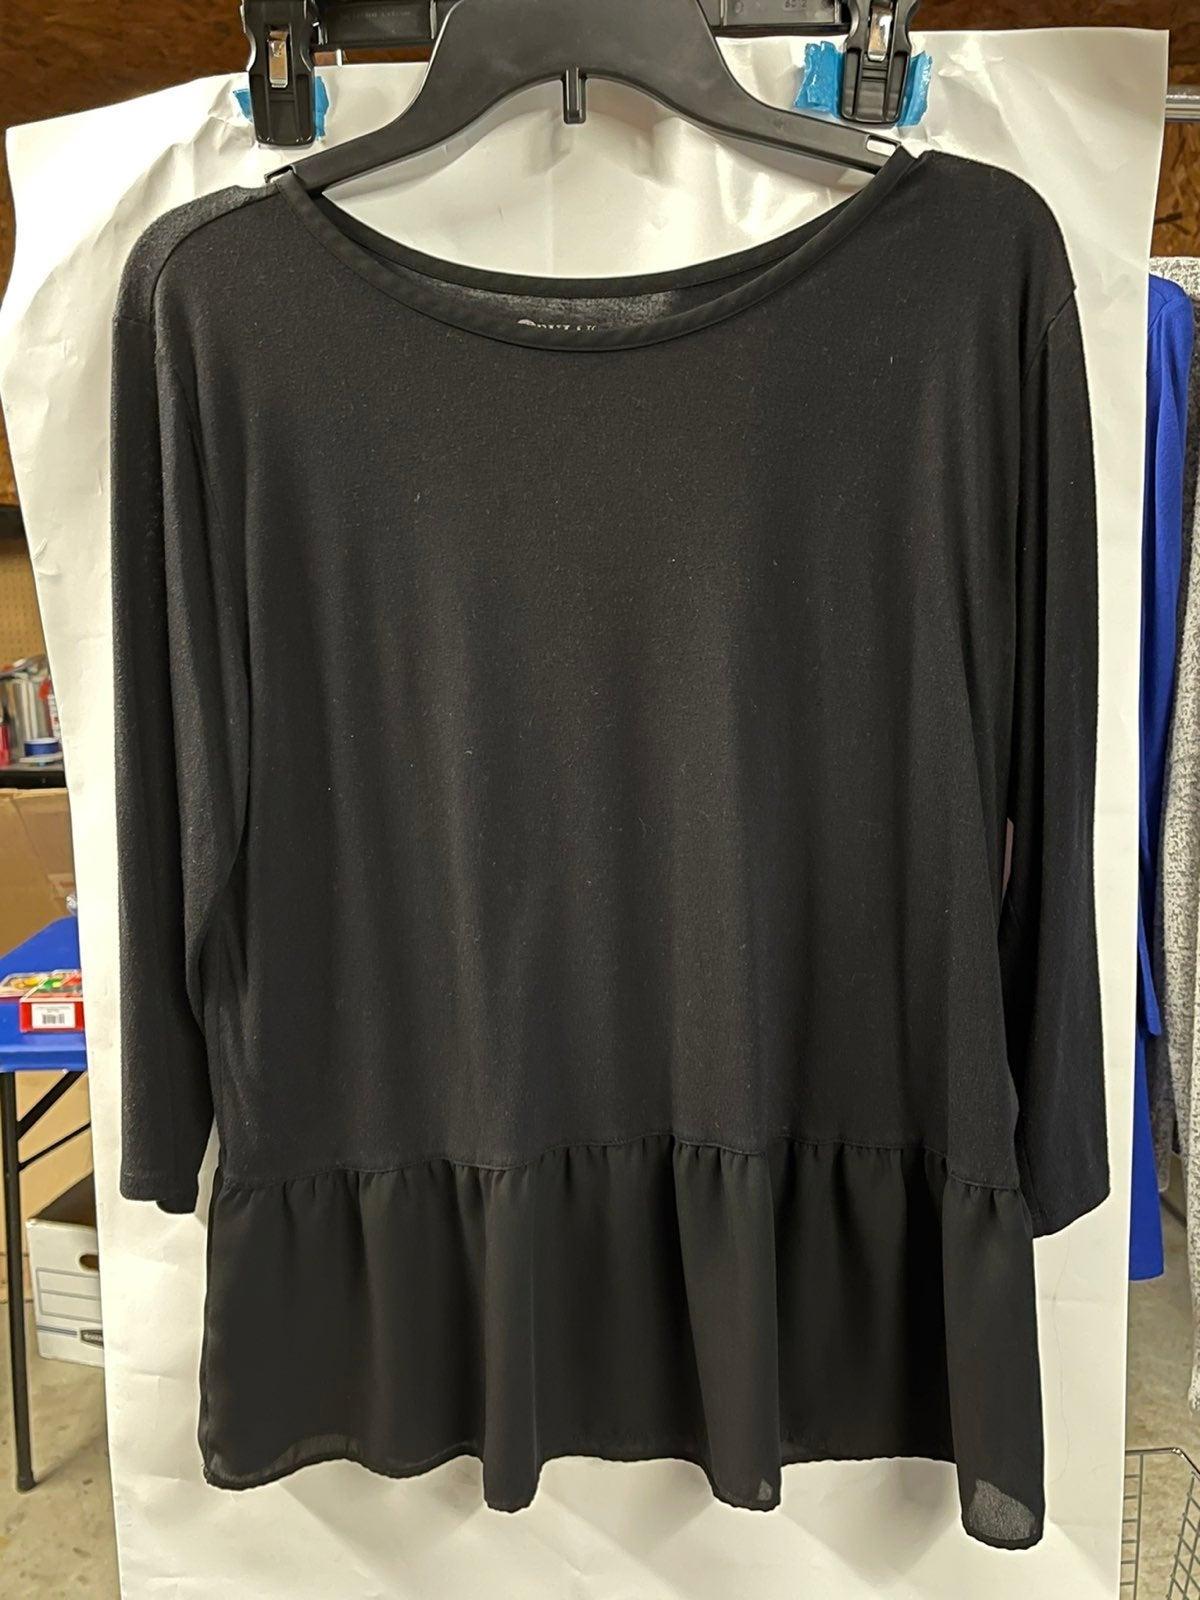 Black 3/4 Sleeve Peplum Top